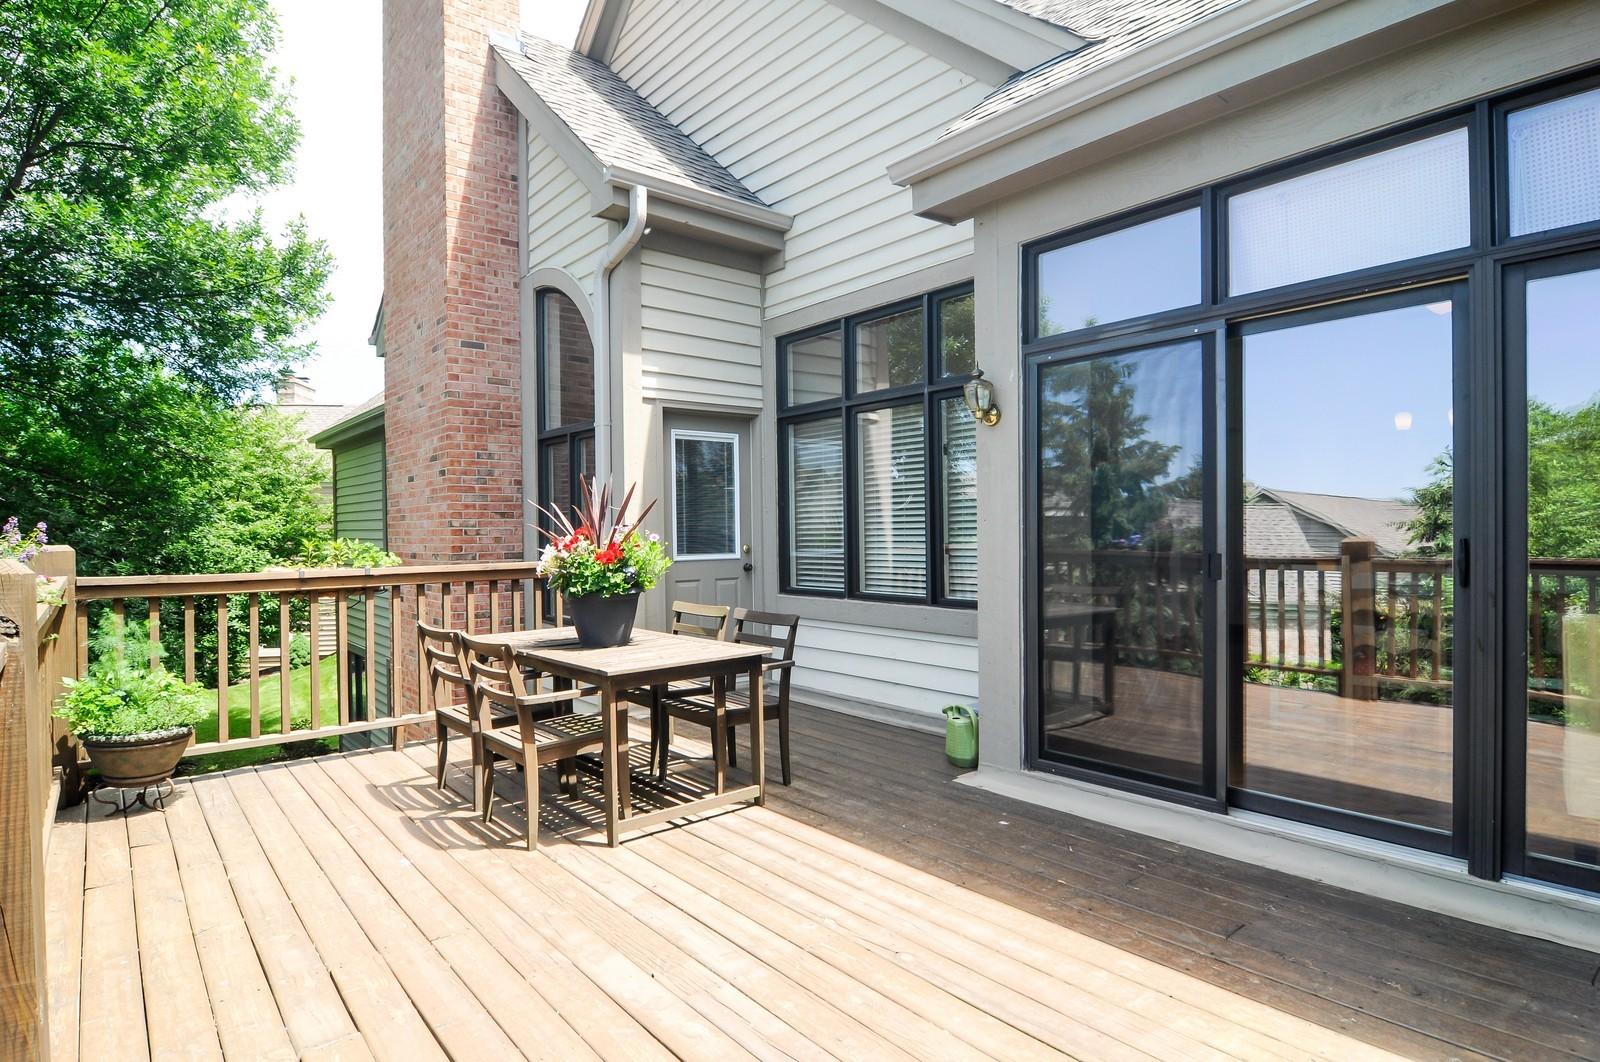 Real Estate Photography - 5 La Costa, Lake in the Hills, IL, 60156 - Deck